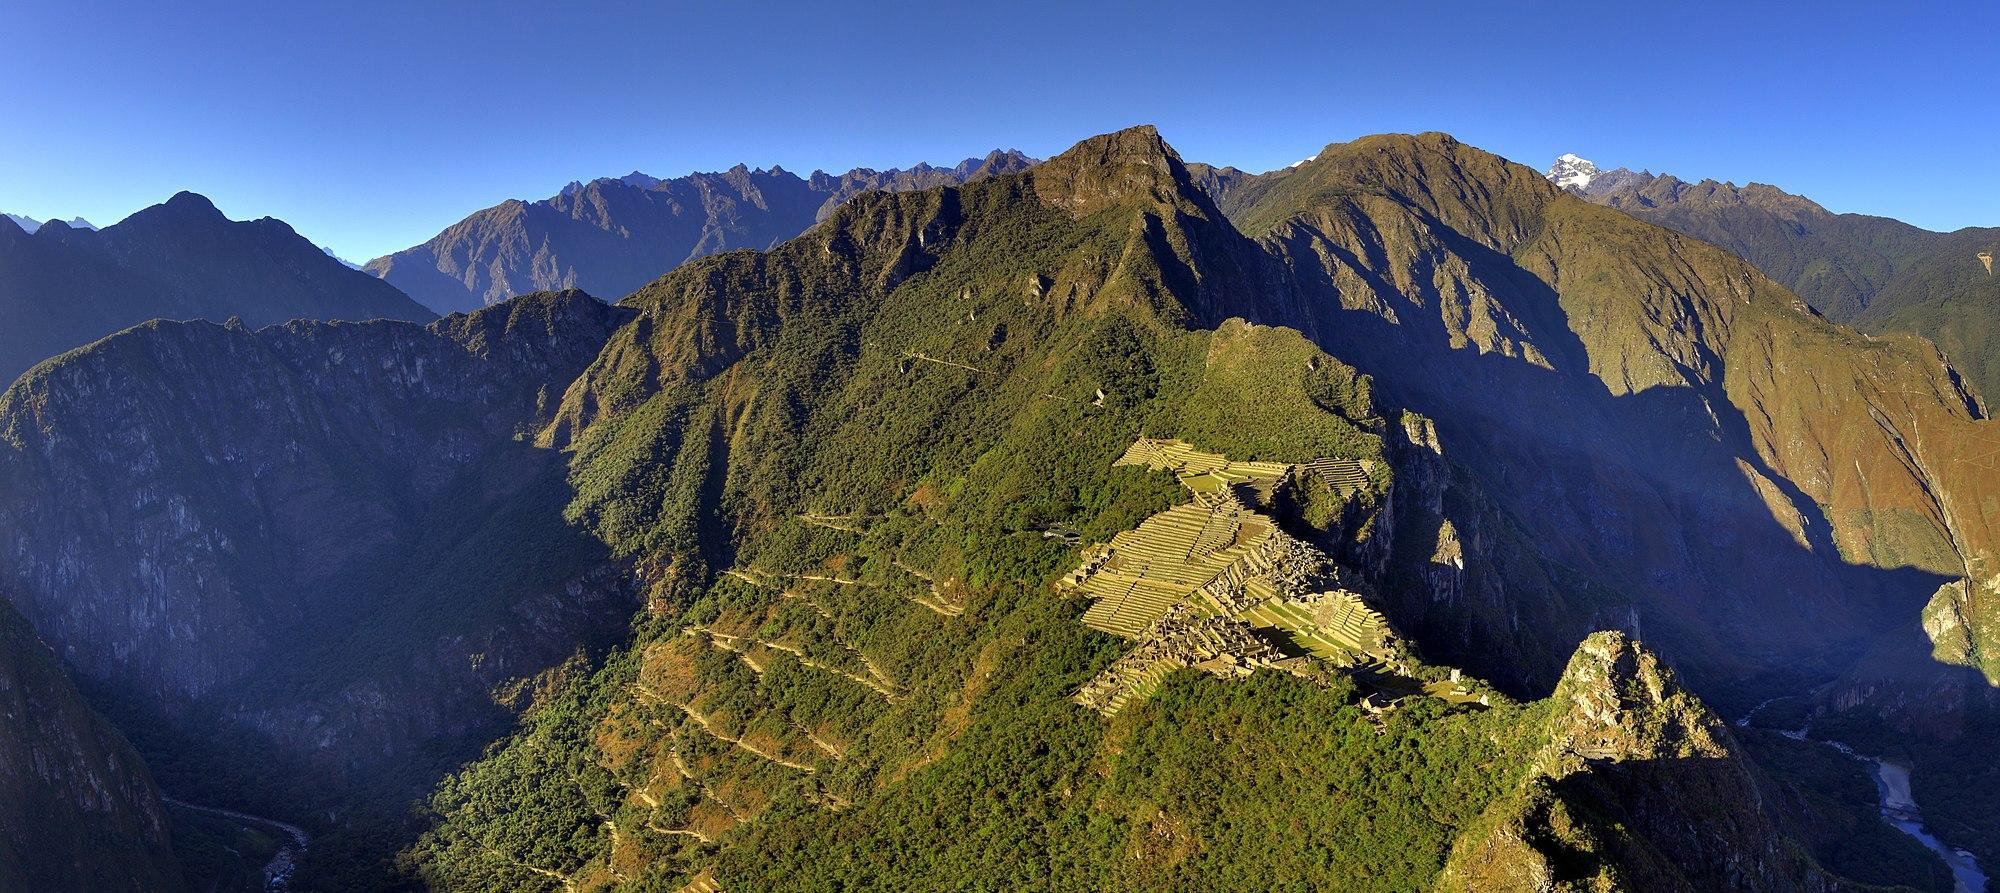 99 - Machu Picchu - Juin 2009.edit3.jpg